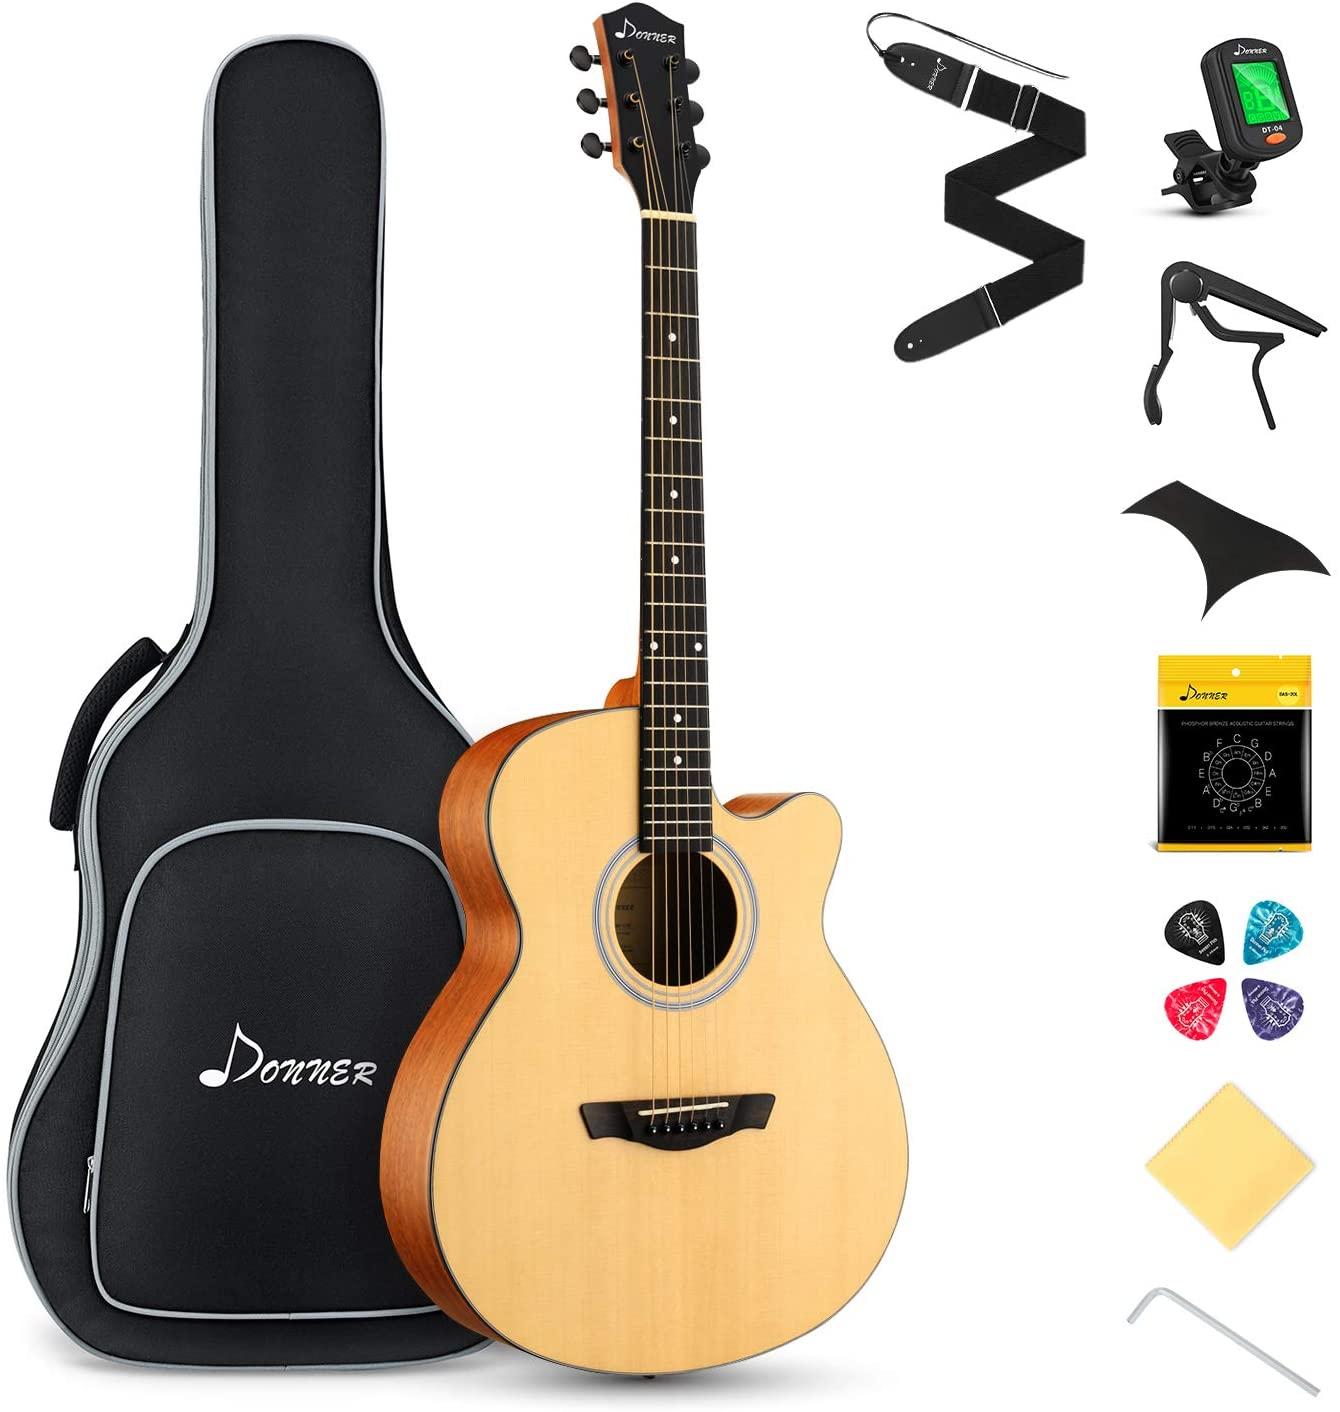 Donner DAJ-110C Mini Jumbo Cutaway Acoustic Guitar Guitar Bundle with Gig Bag Capo Picks Strap String